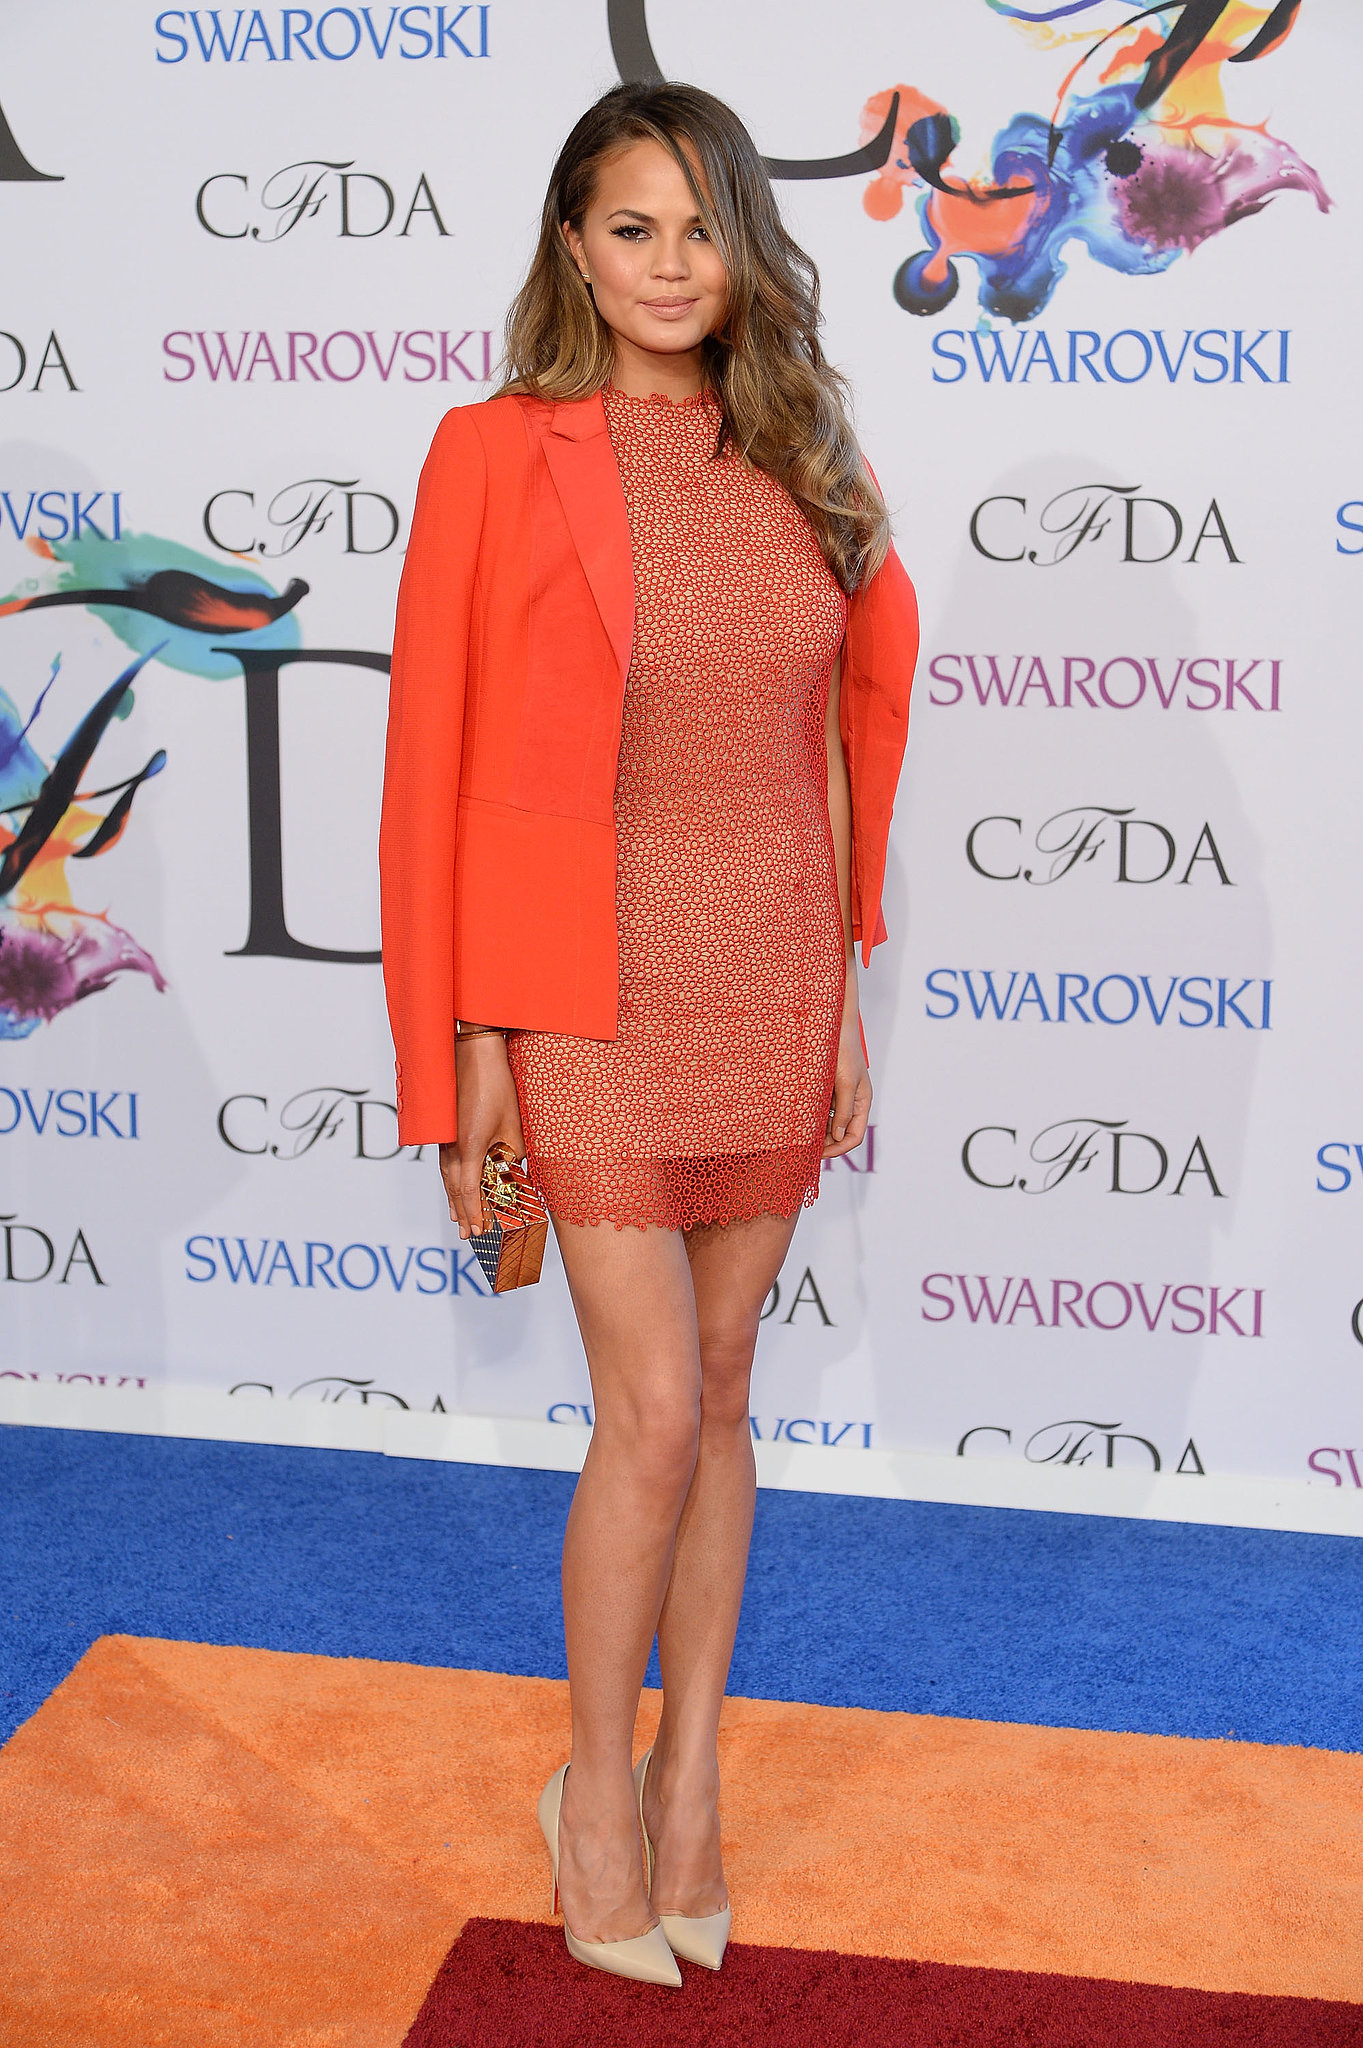 Chrissy Teigen at the 2014 CFDA Awards